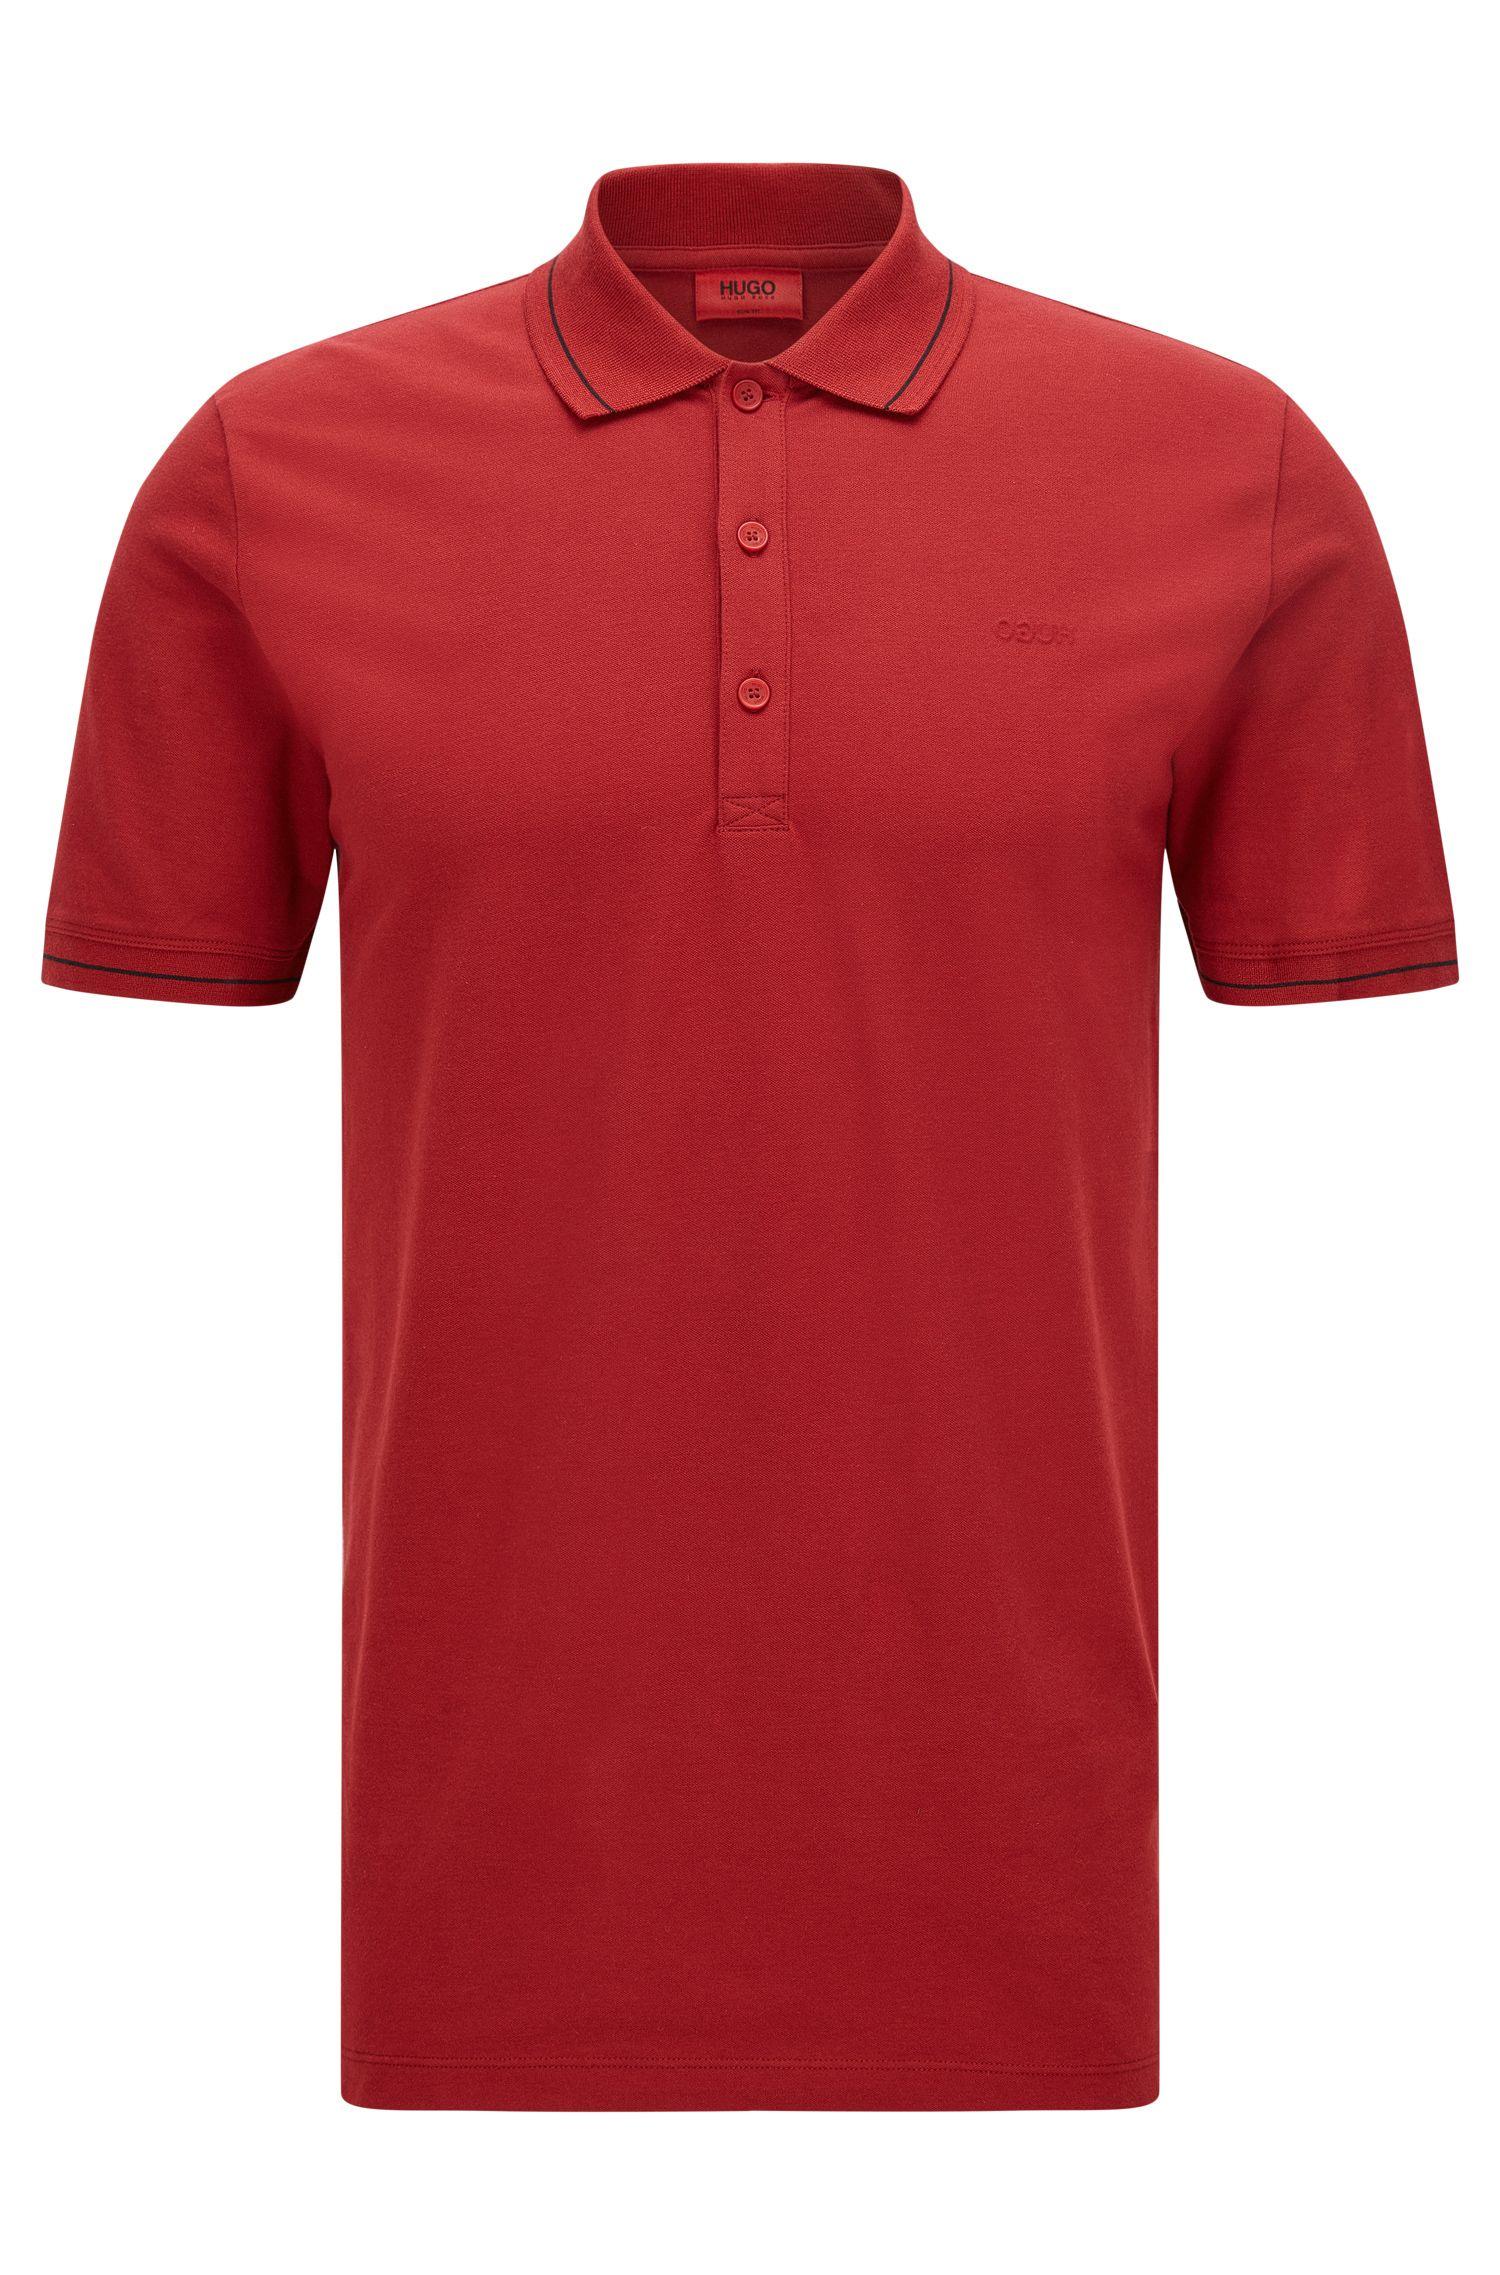 Stretch Cotton Polo, Slim Fit | Daymont